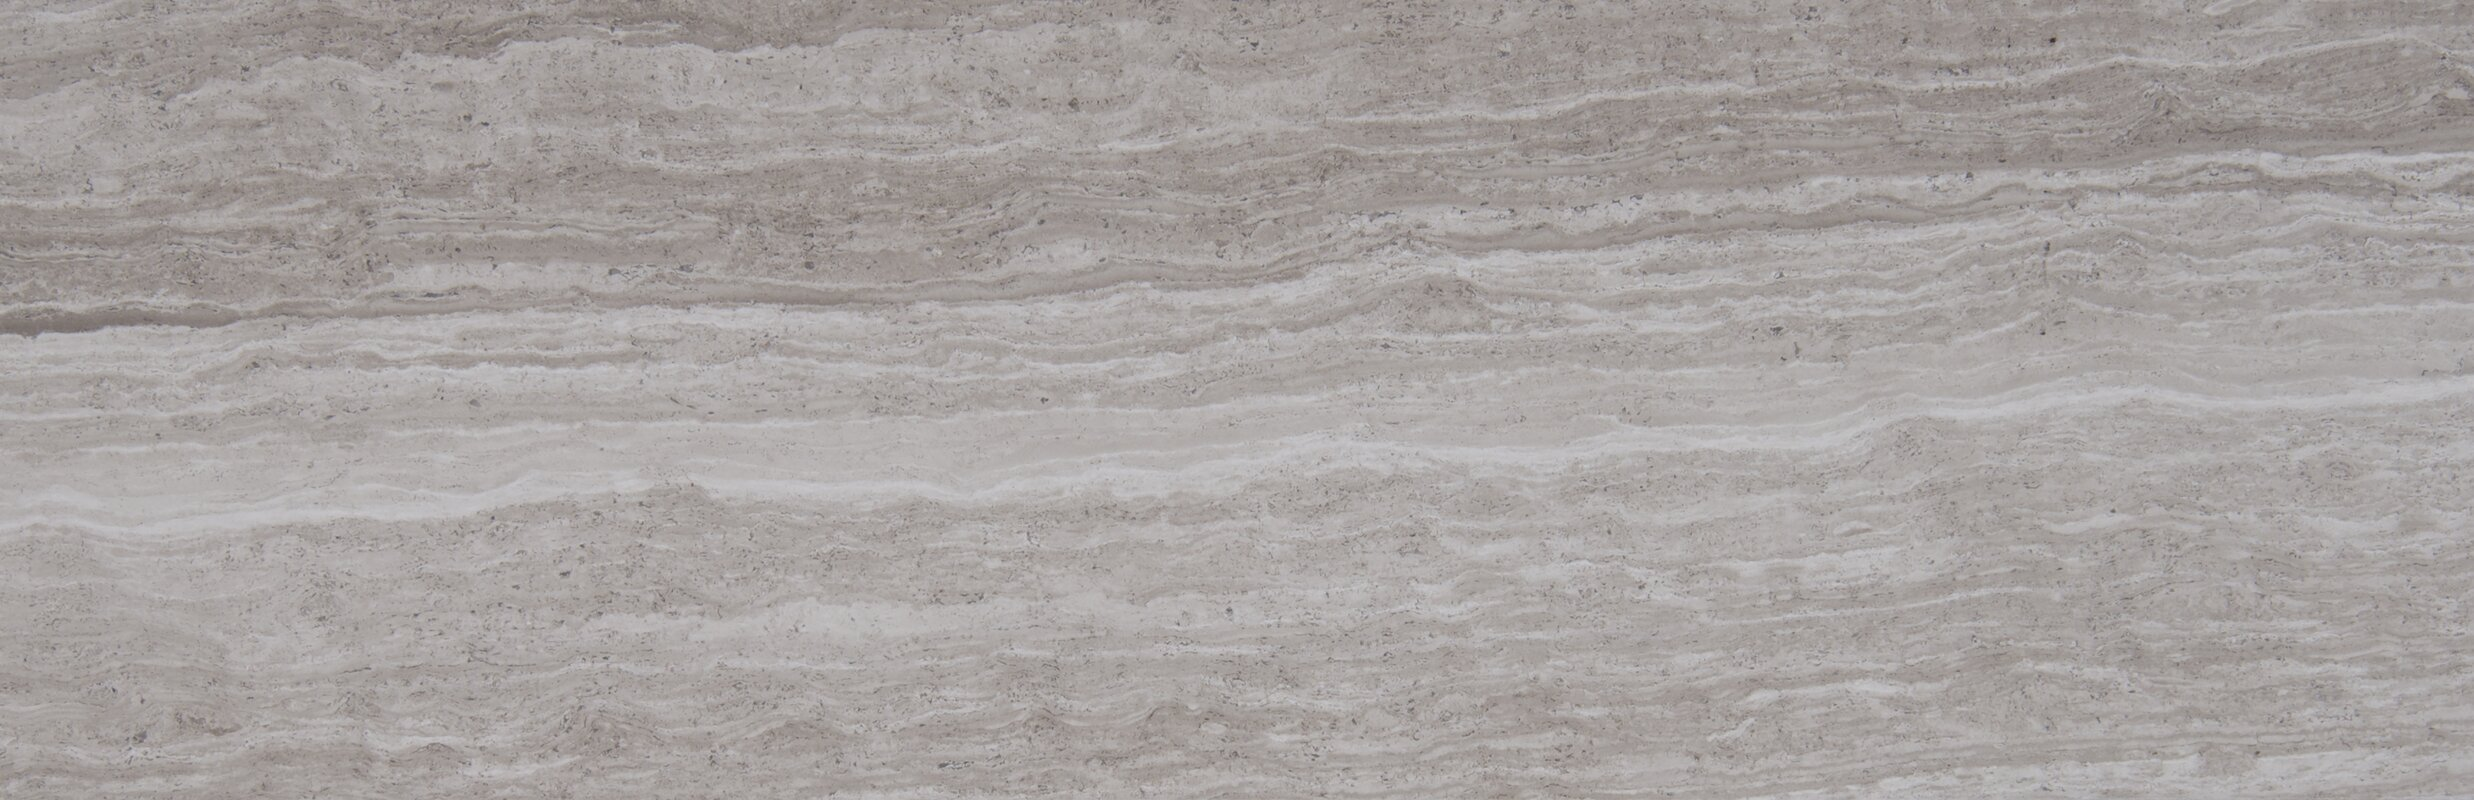 Msi 4 X 12 Marble Tile In White Oak Reviews Wayfair